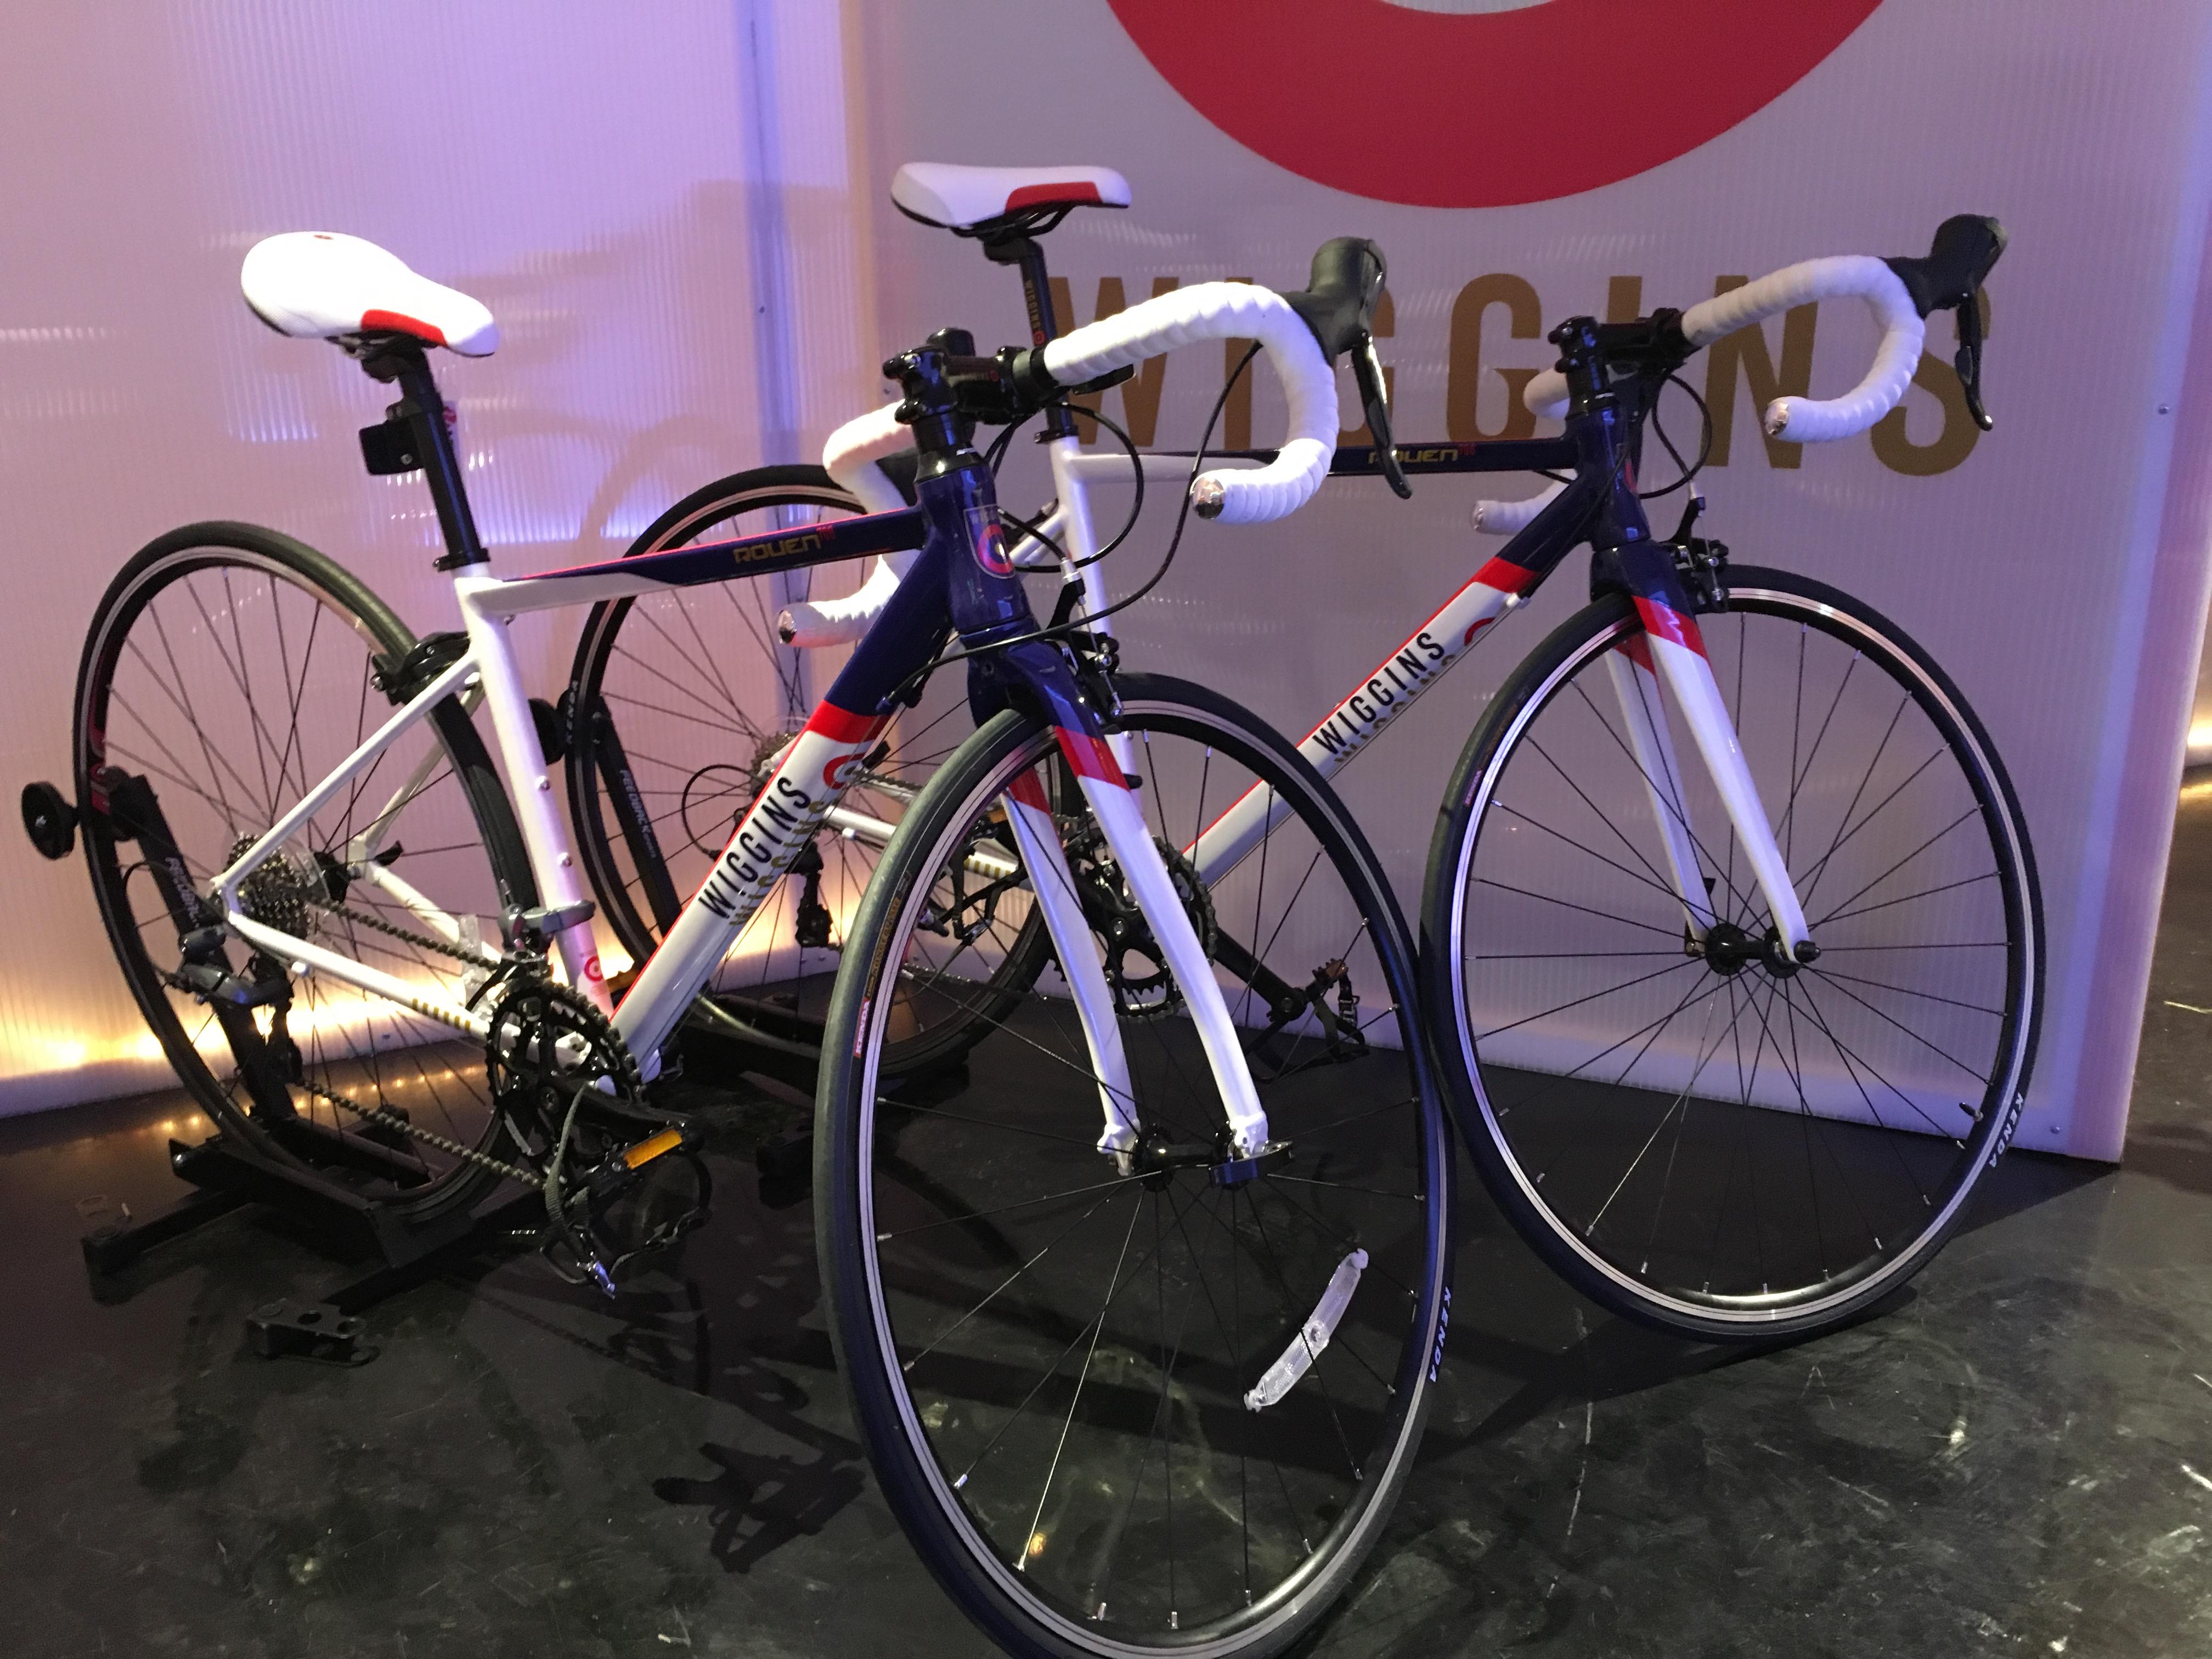 Halfords partners with Sir Bradley Wiggins on bike range, announces